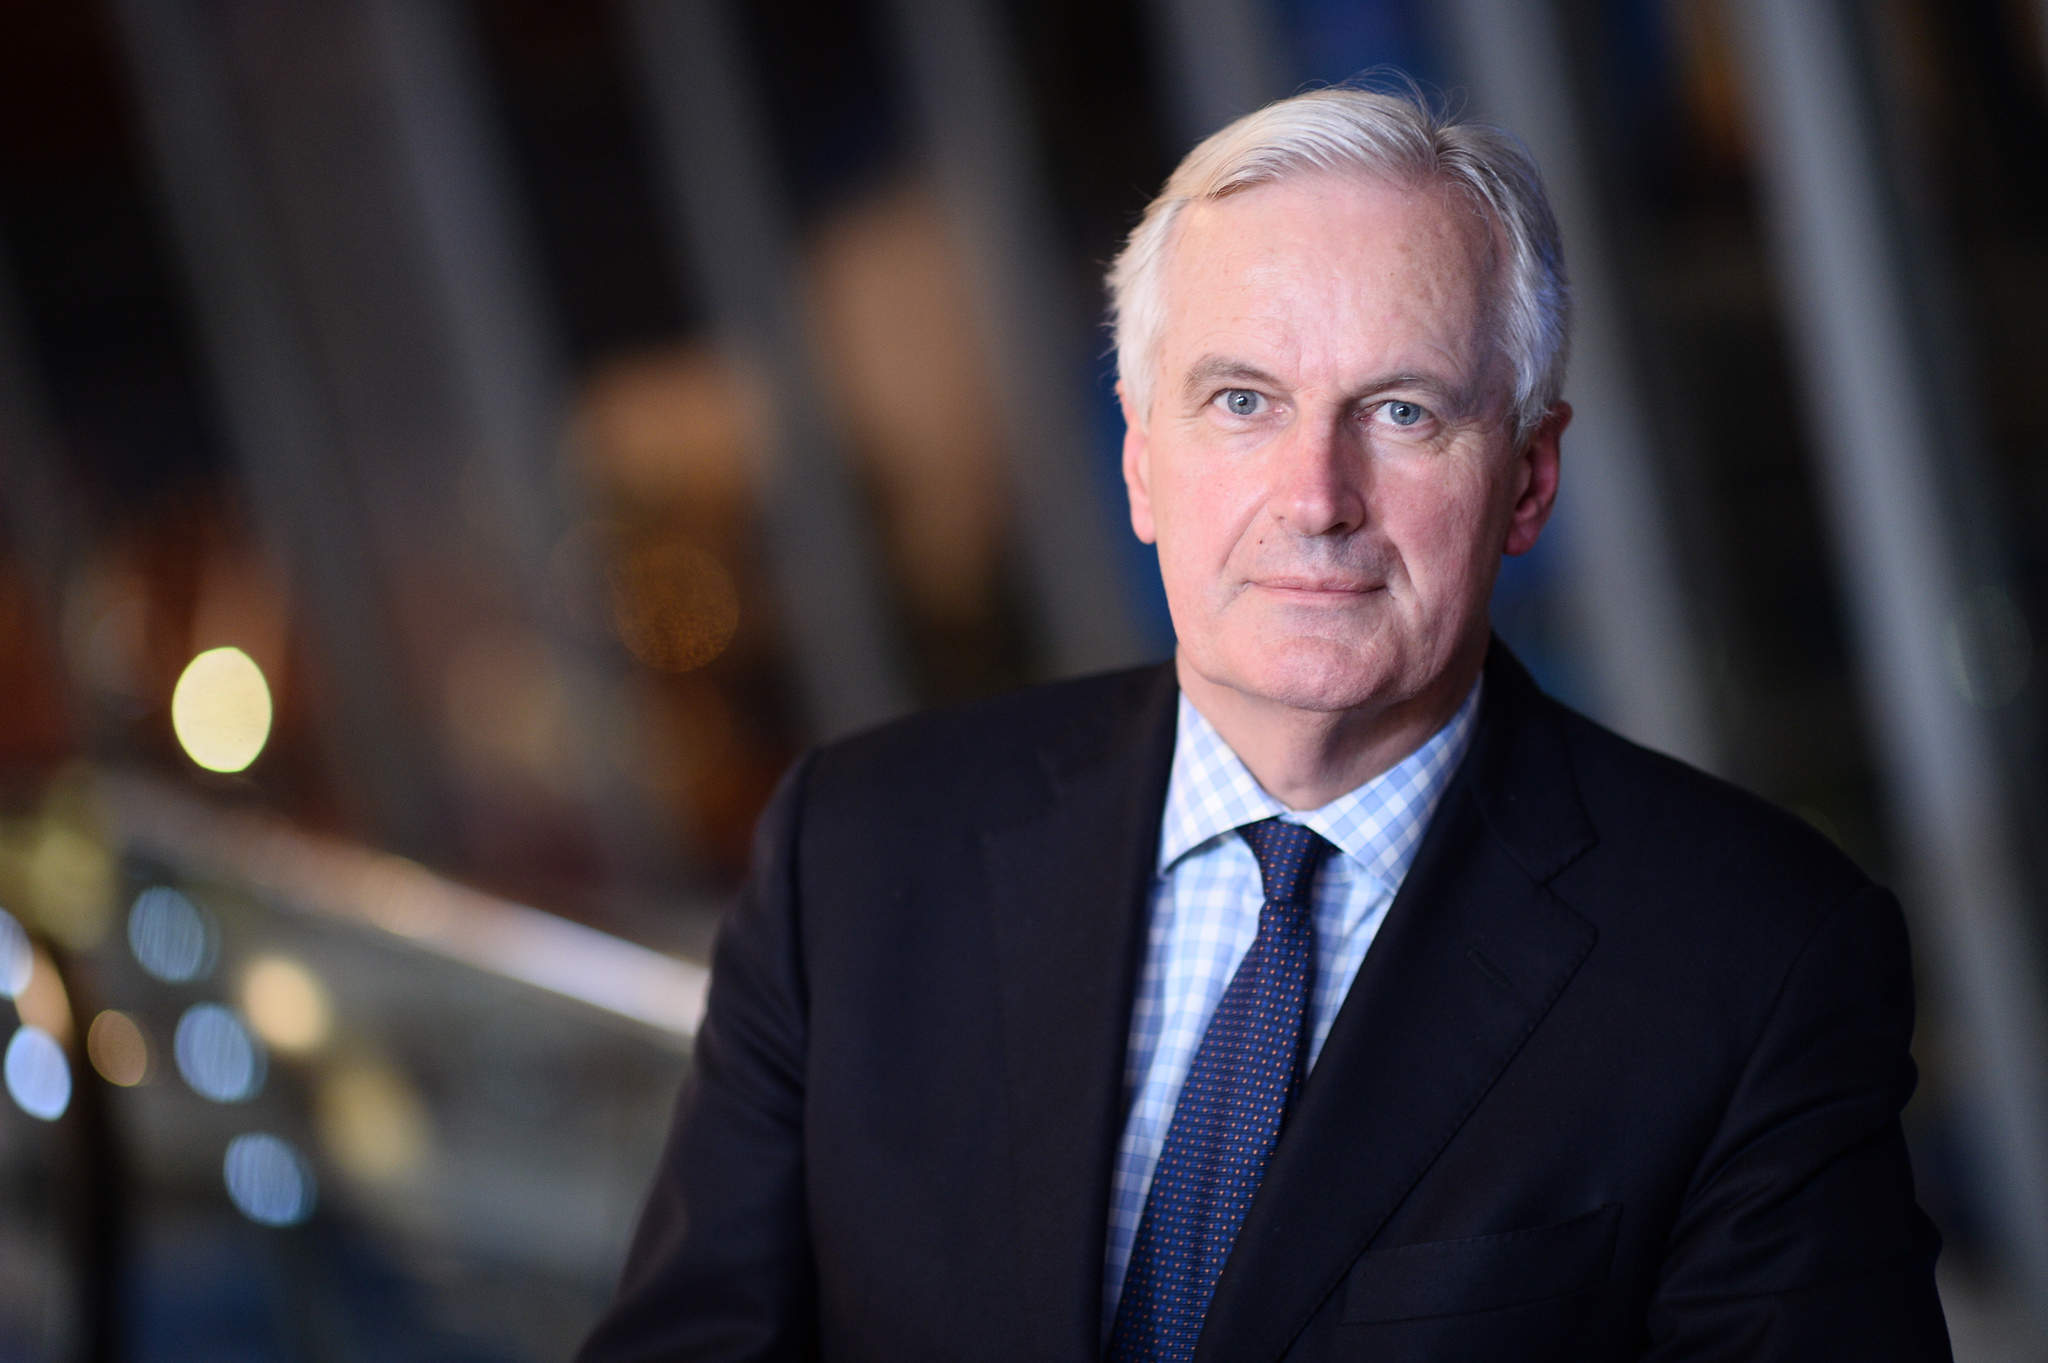 Michel Barnier Brexit - Verdict